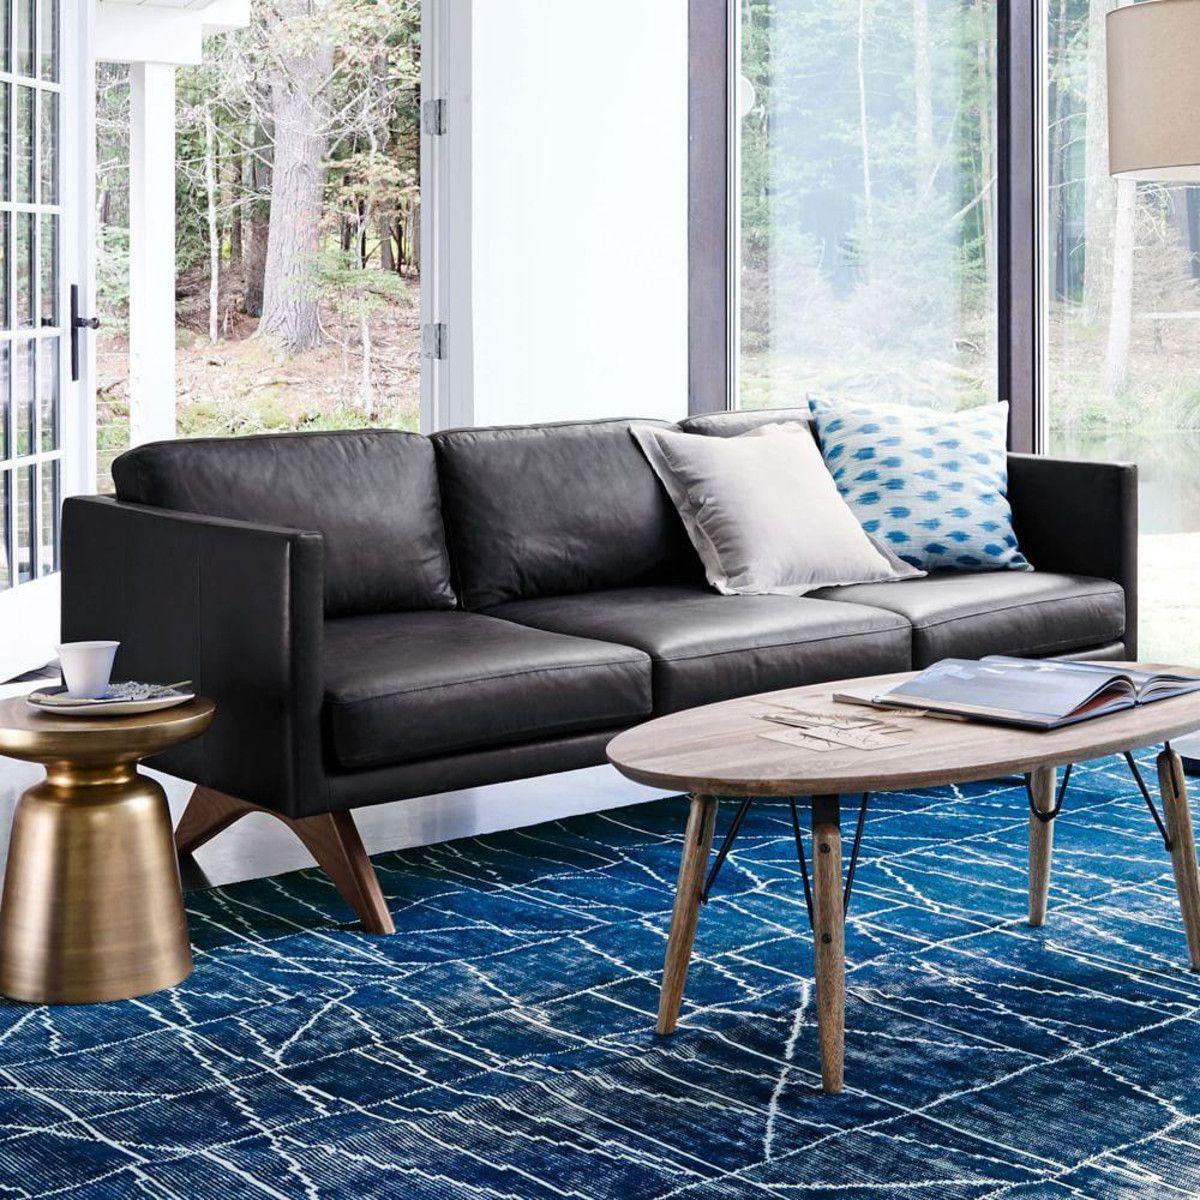 West Elm Living Room Modern Furniture Home Decor Home Accessories West Elm Sofas